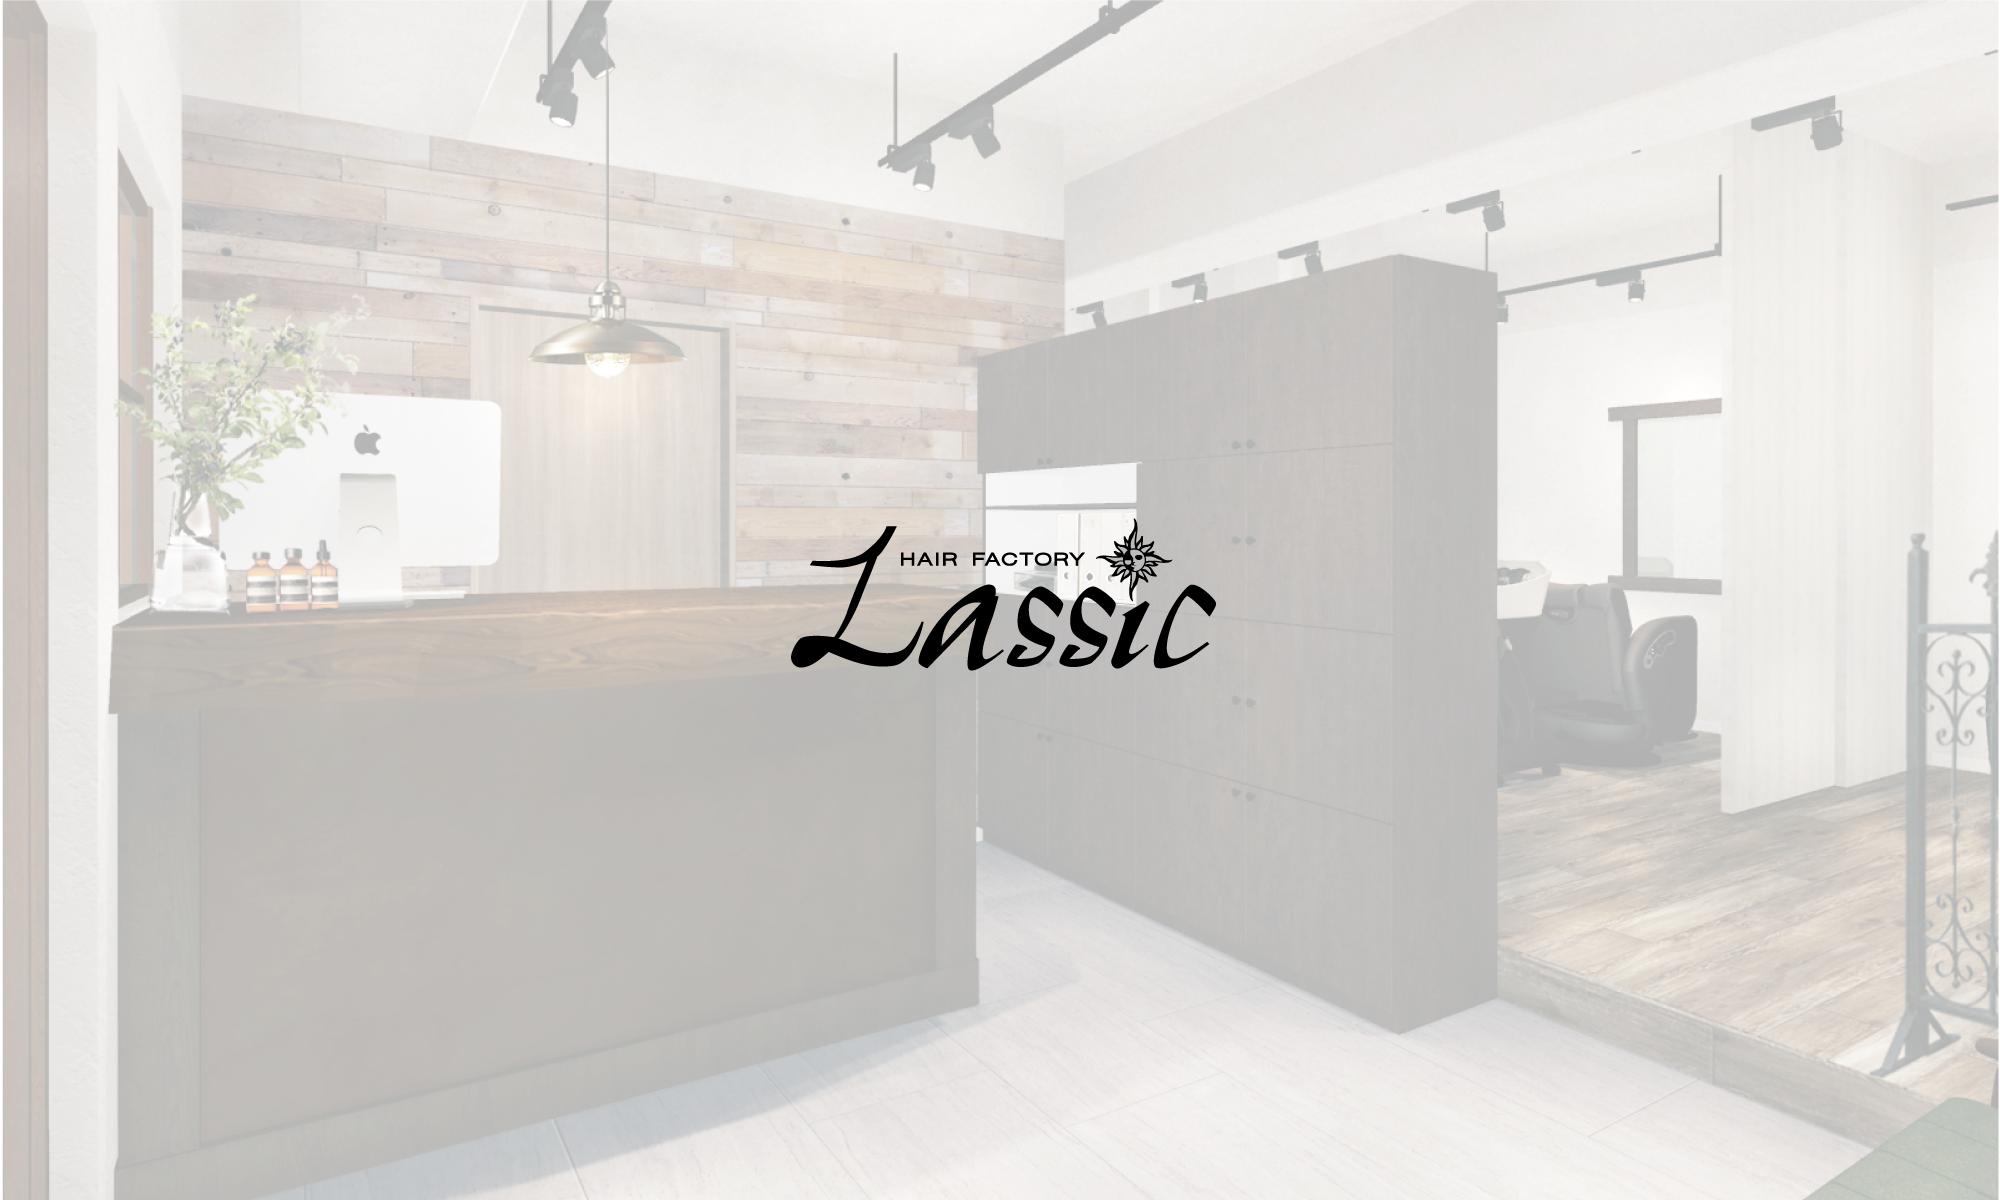 HAIR FACTORY Lassic